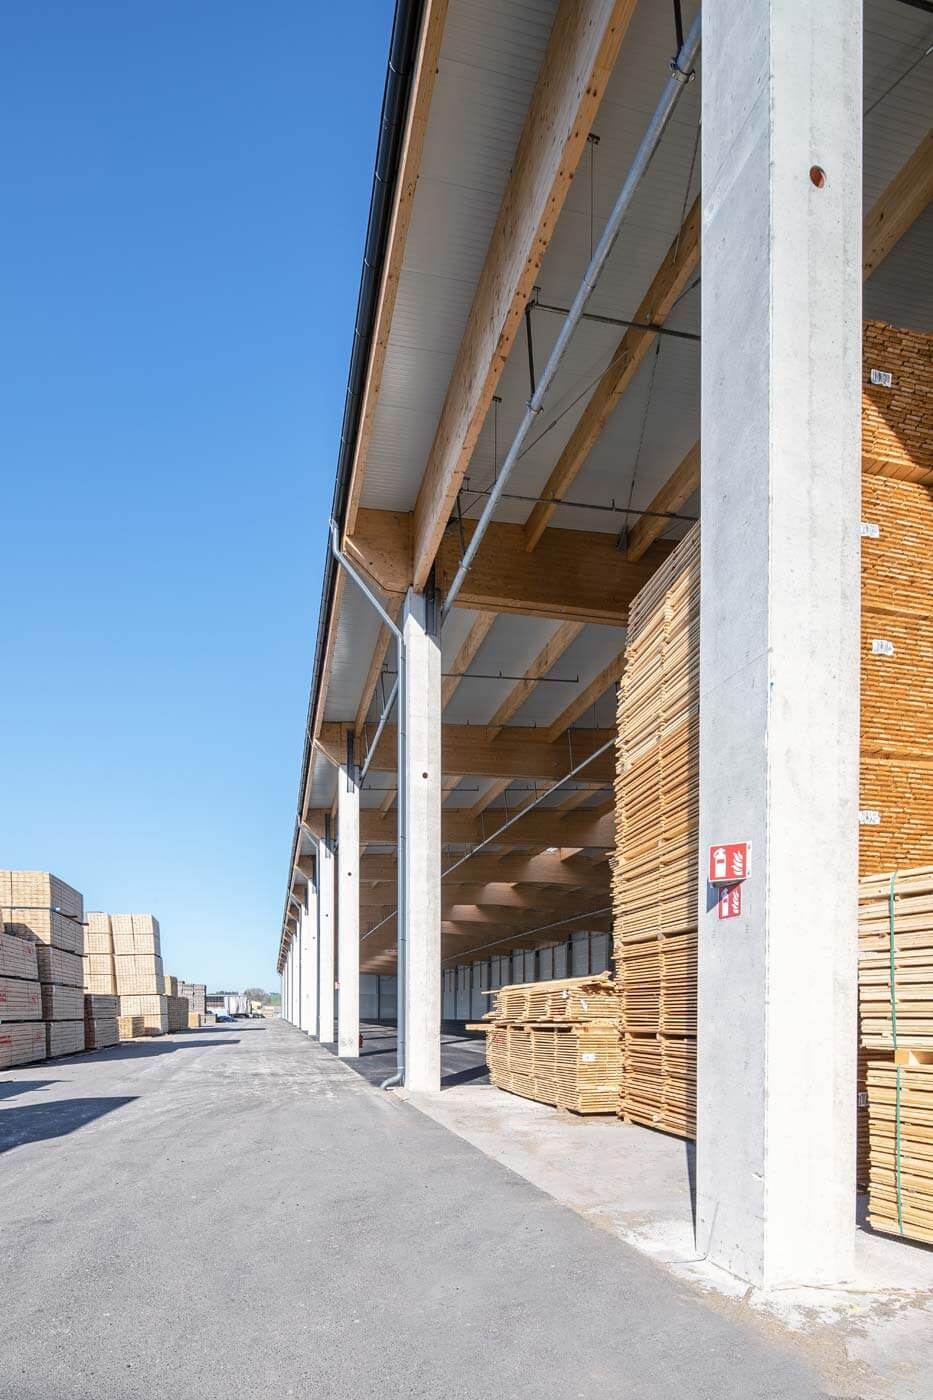 VM Holz Halle aussen vertikal